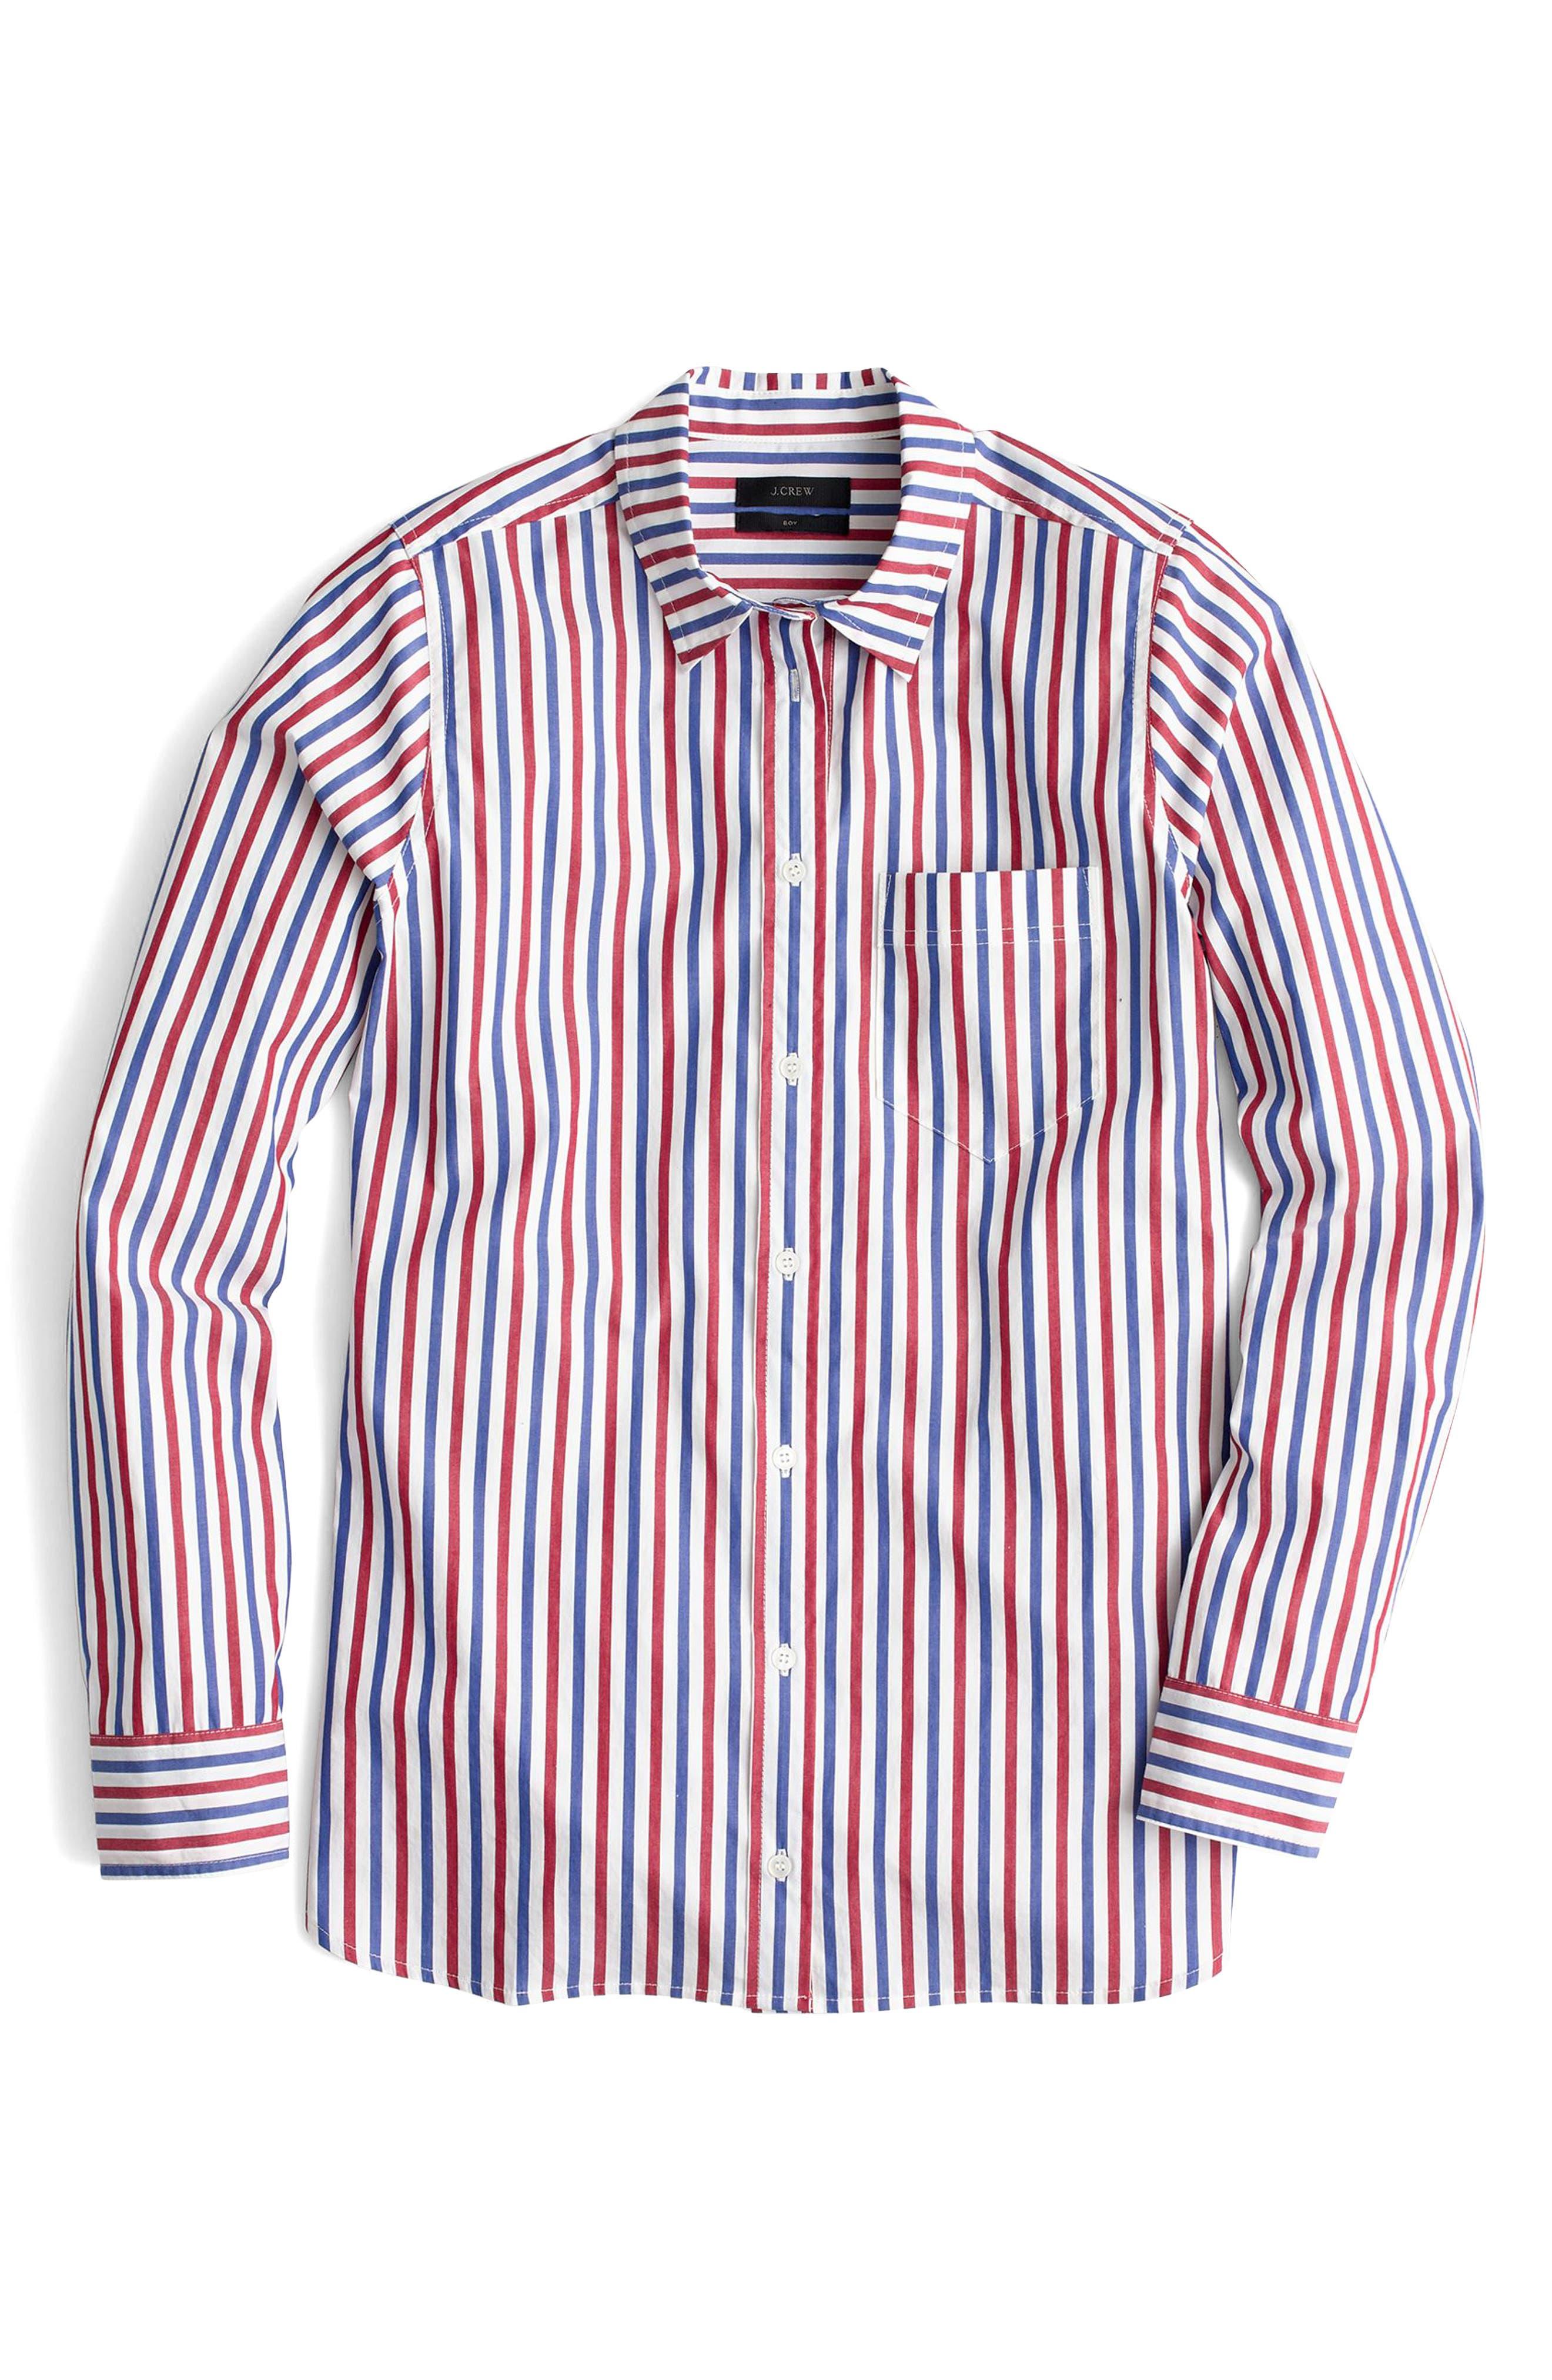 J. Crew Stripe Boyfriend Shirt,                             Alternate thumbnail 2, color,                             600